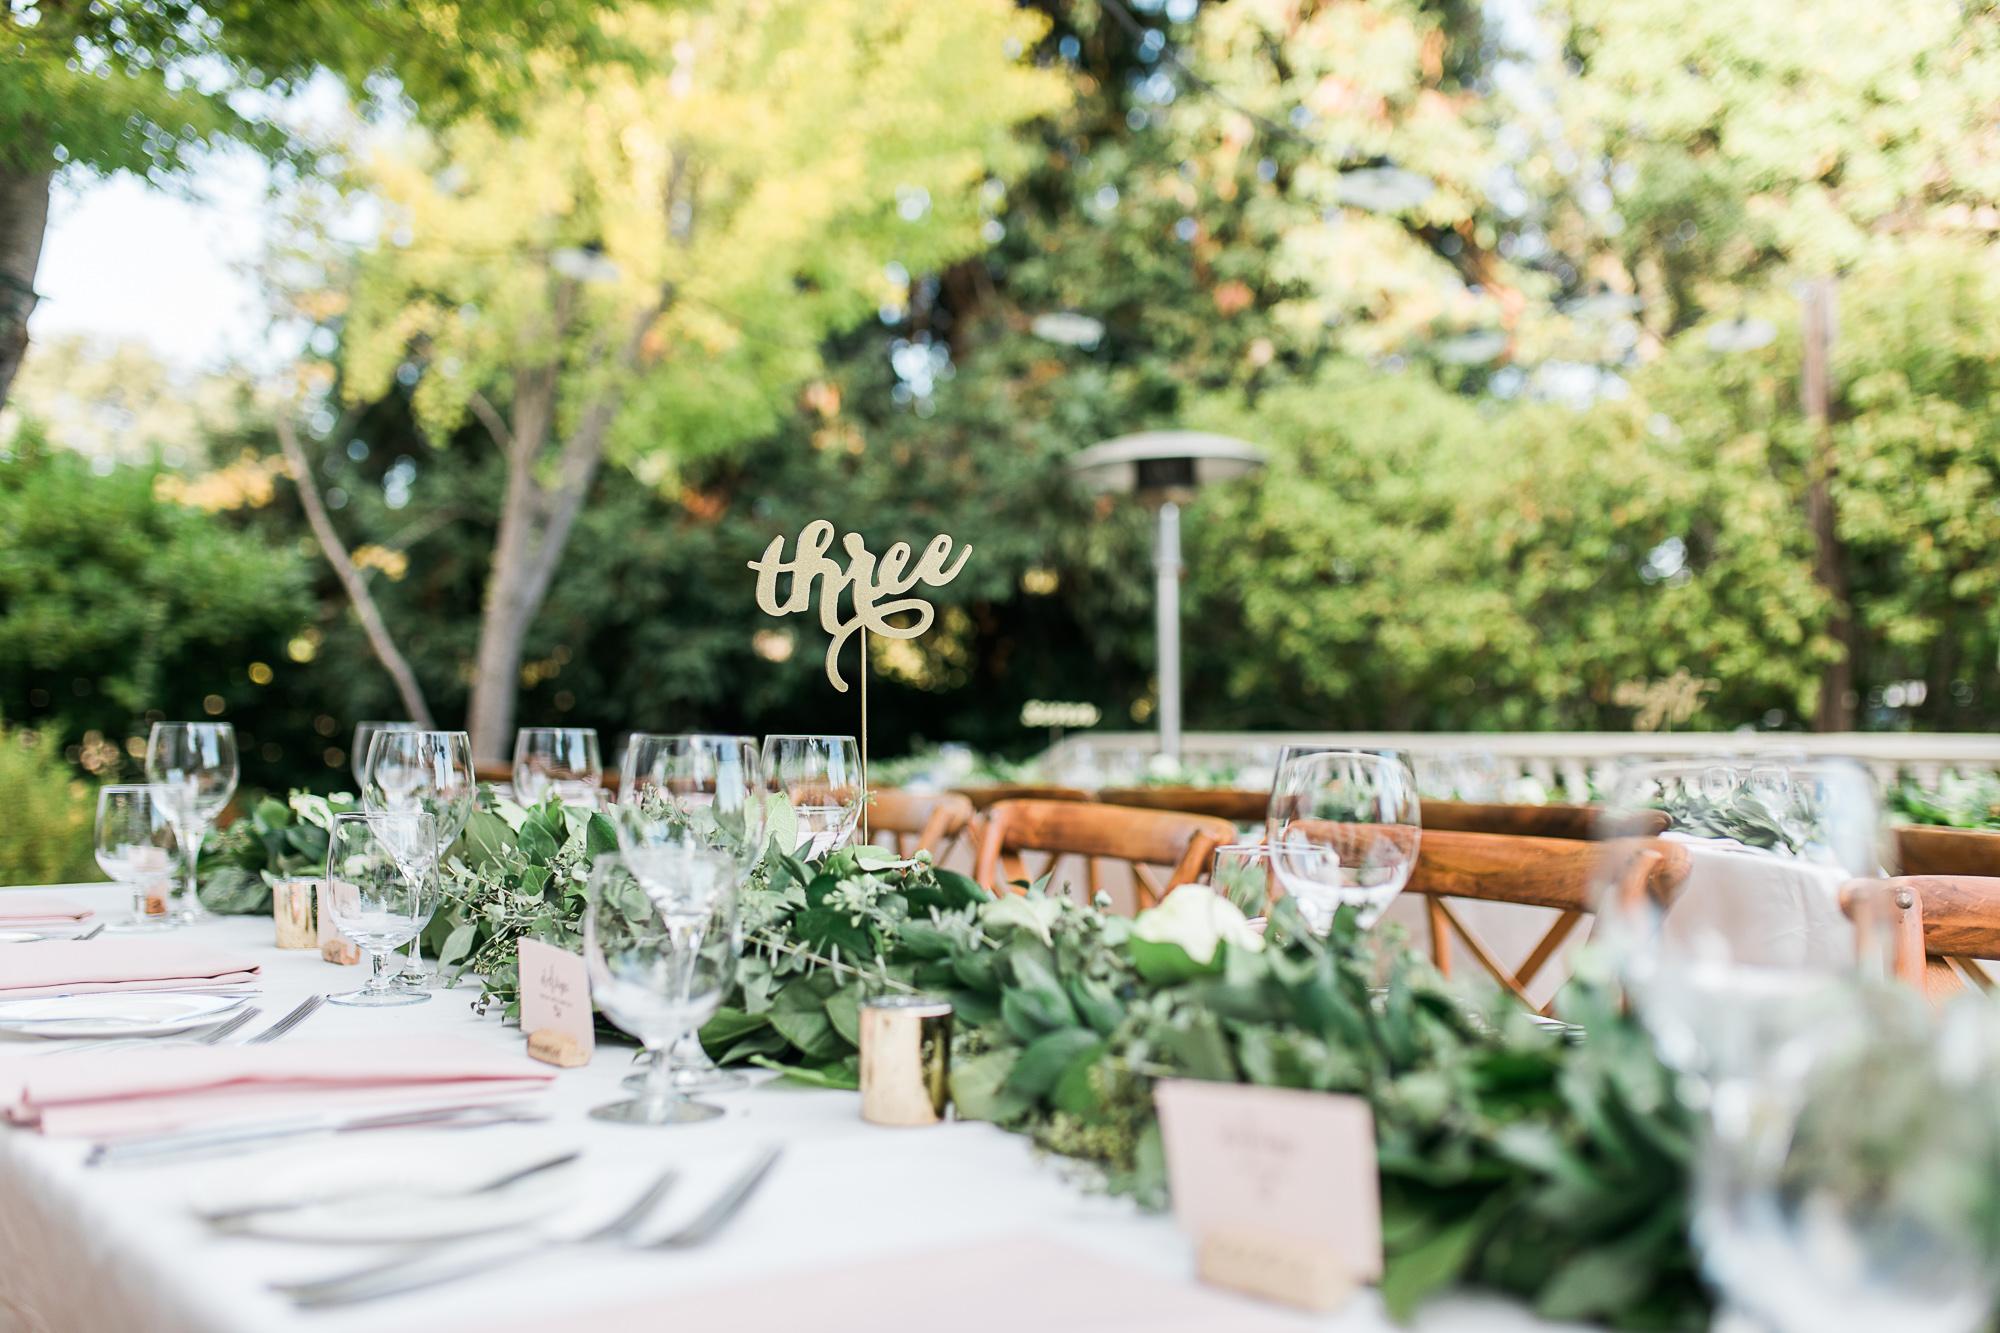 Generals+Daughter+Wedding+Photos+by+JBJ+Pictures+-+Ramekins+Wedding+Venue+Photographer+in+Sonoma+Napa+(25).jpg